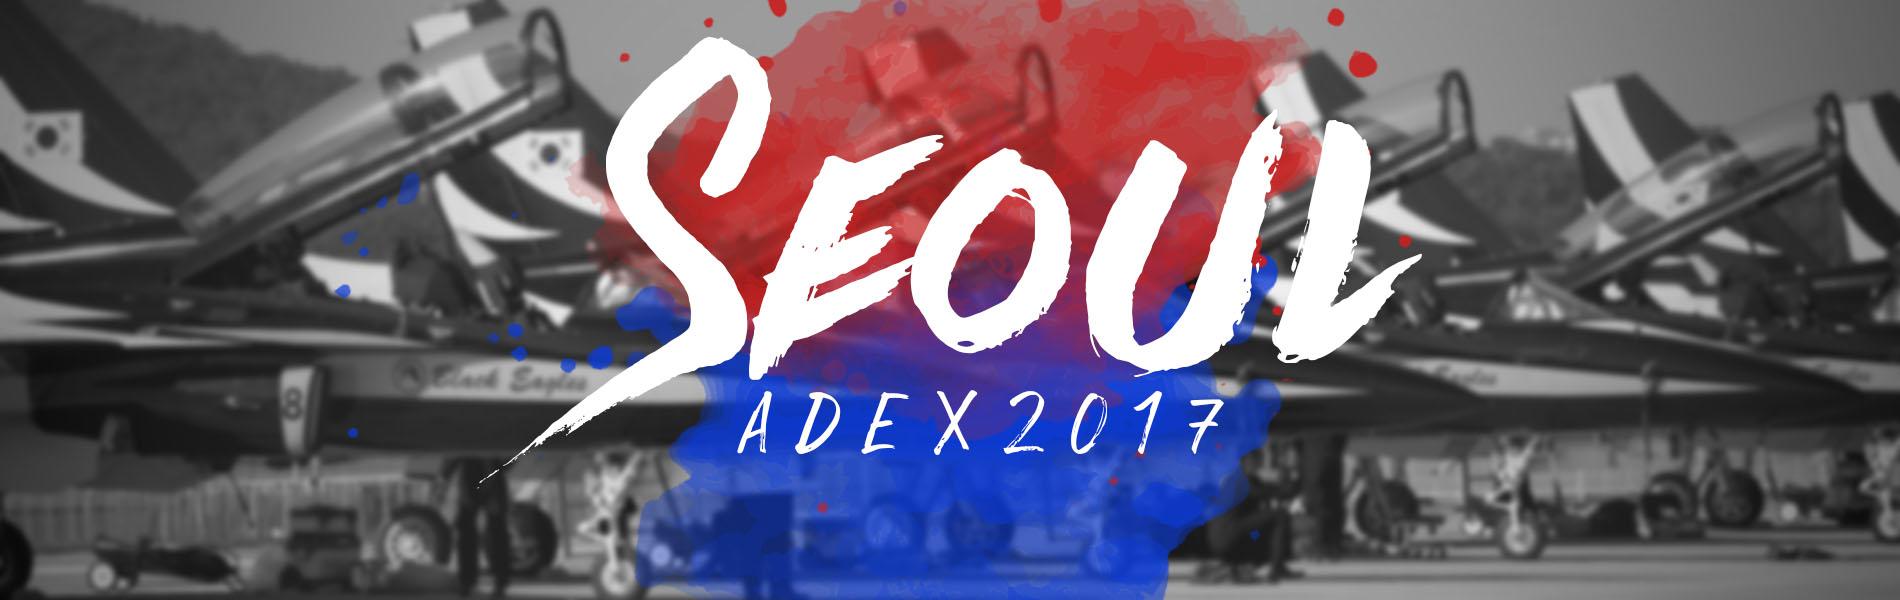 http://tnaviation.net/airshow/seoul-adex-2017